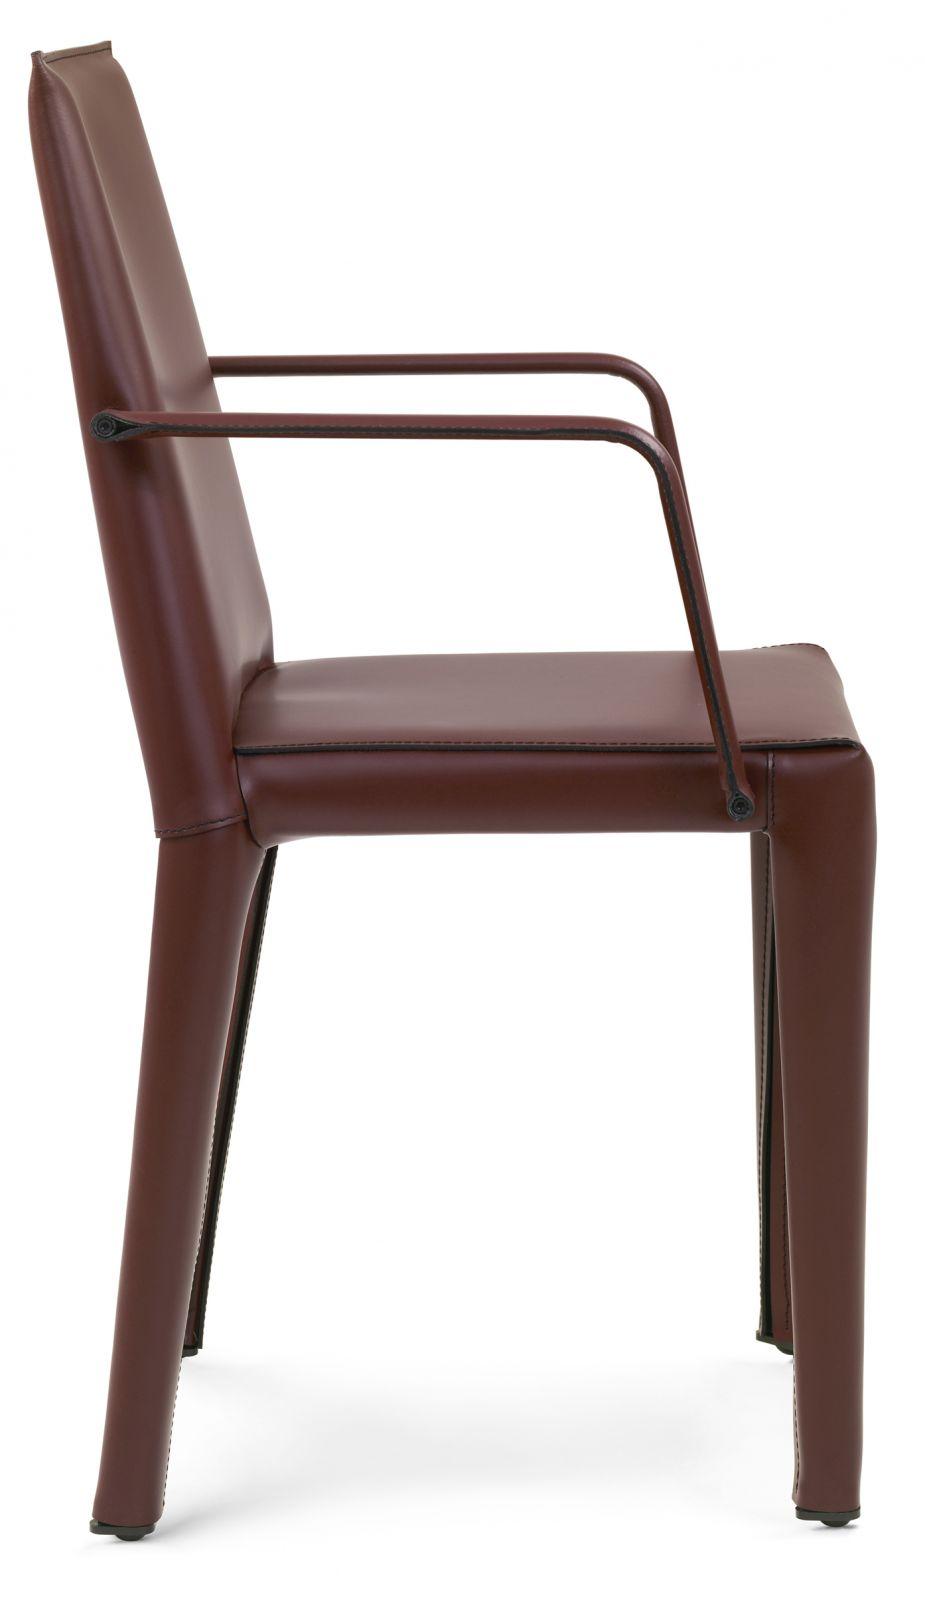 modern-office-furniture-chairs-Italian-designer-furniture (20).jpg